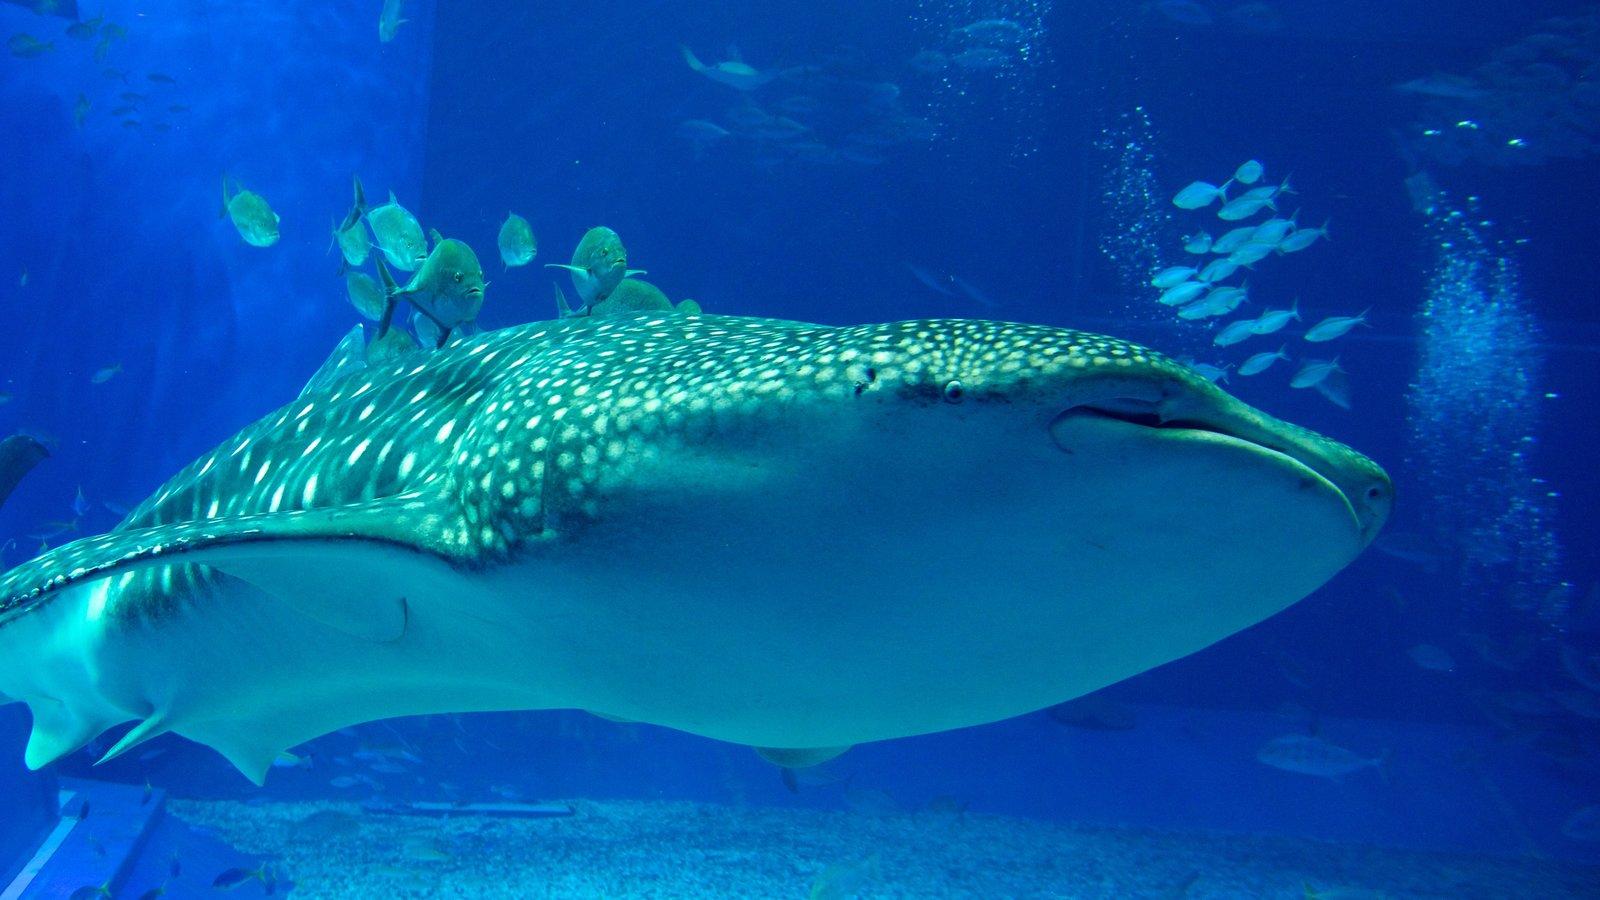 Okinawa Churaumi Aquarium showing marine life